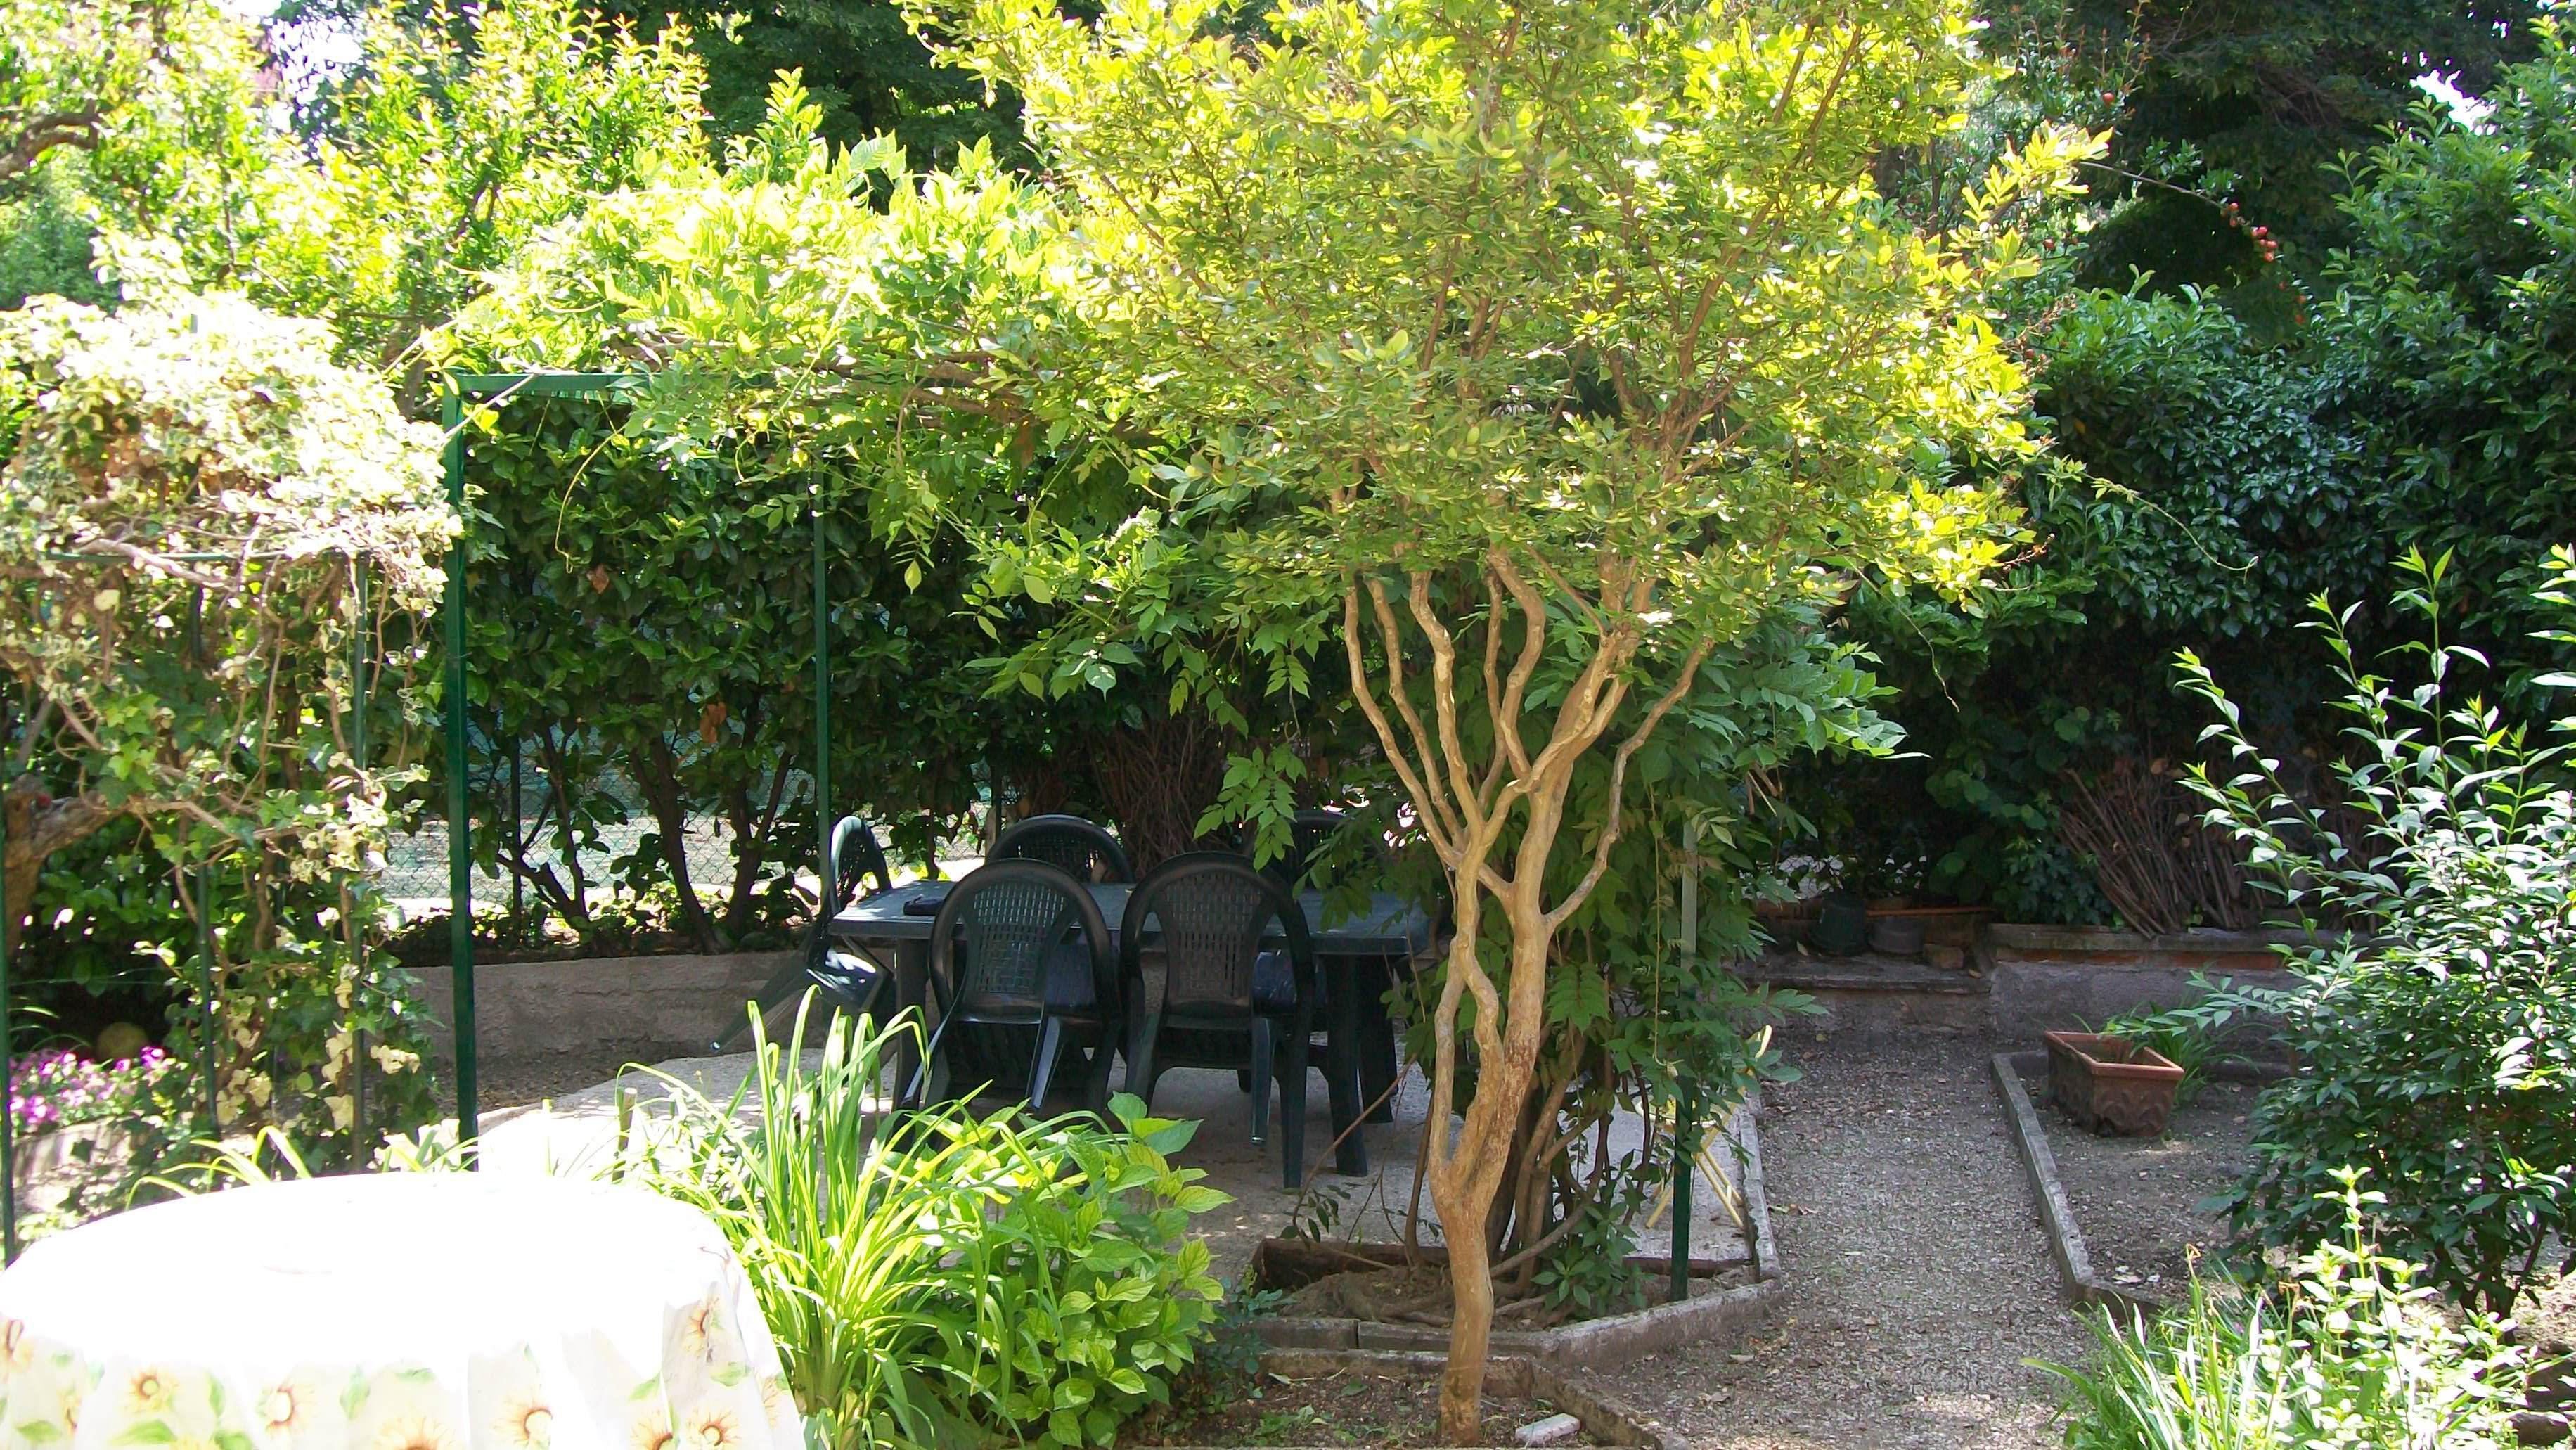 Il giardino nel parco r b bologna - B b il giardino trento ...